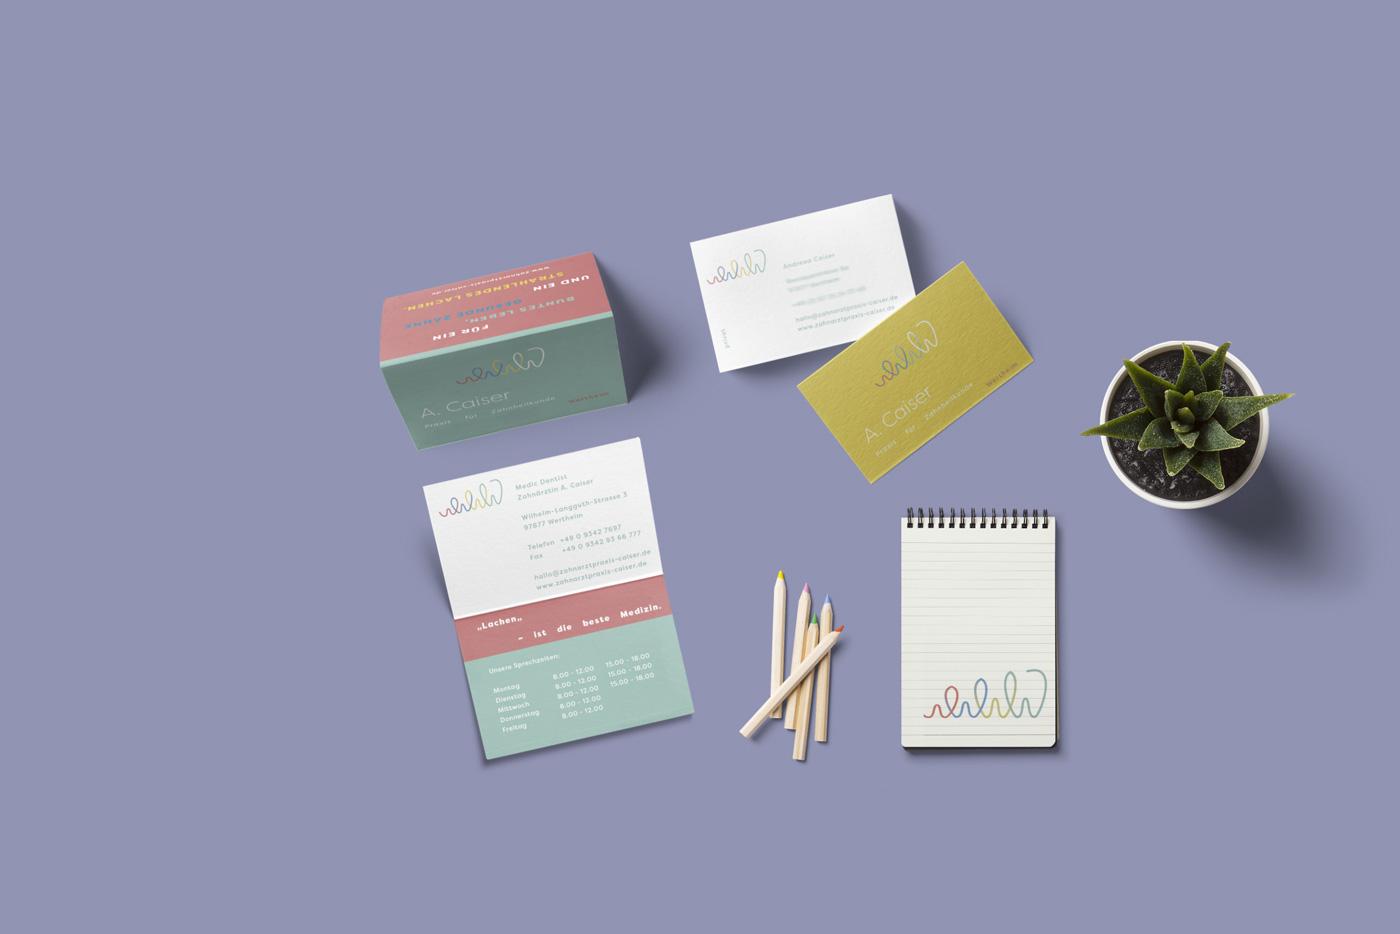 Praxis_Caiser_Branding_Corporate_Identity_businesscard_Zahnarzt_Design_Studio_Michael-Seidl.jpg